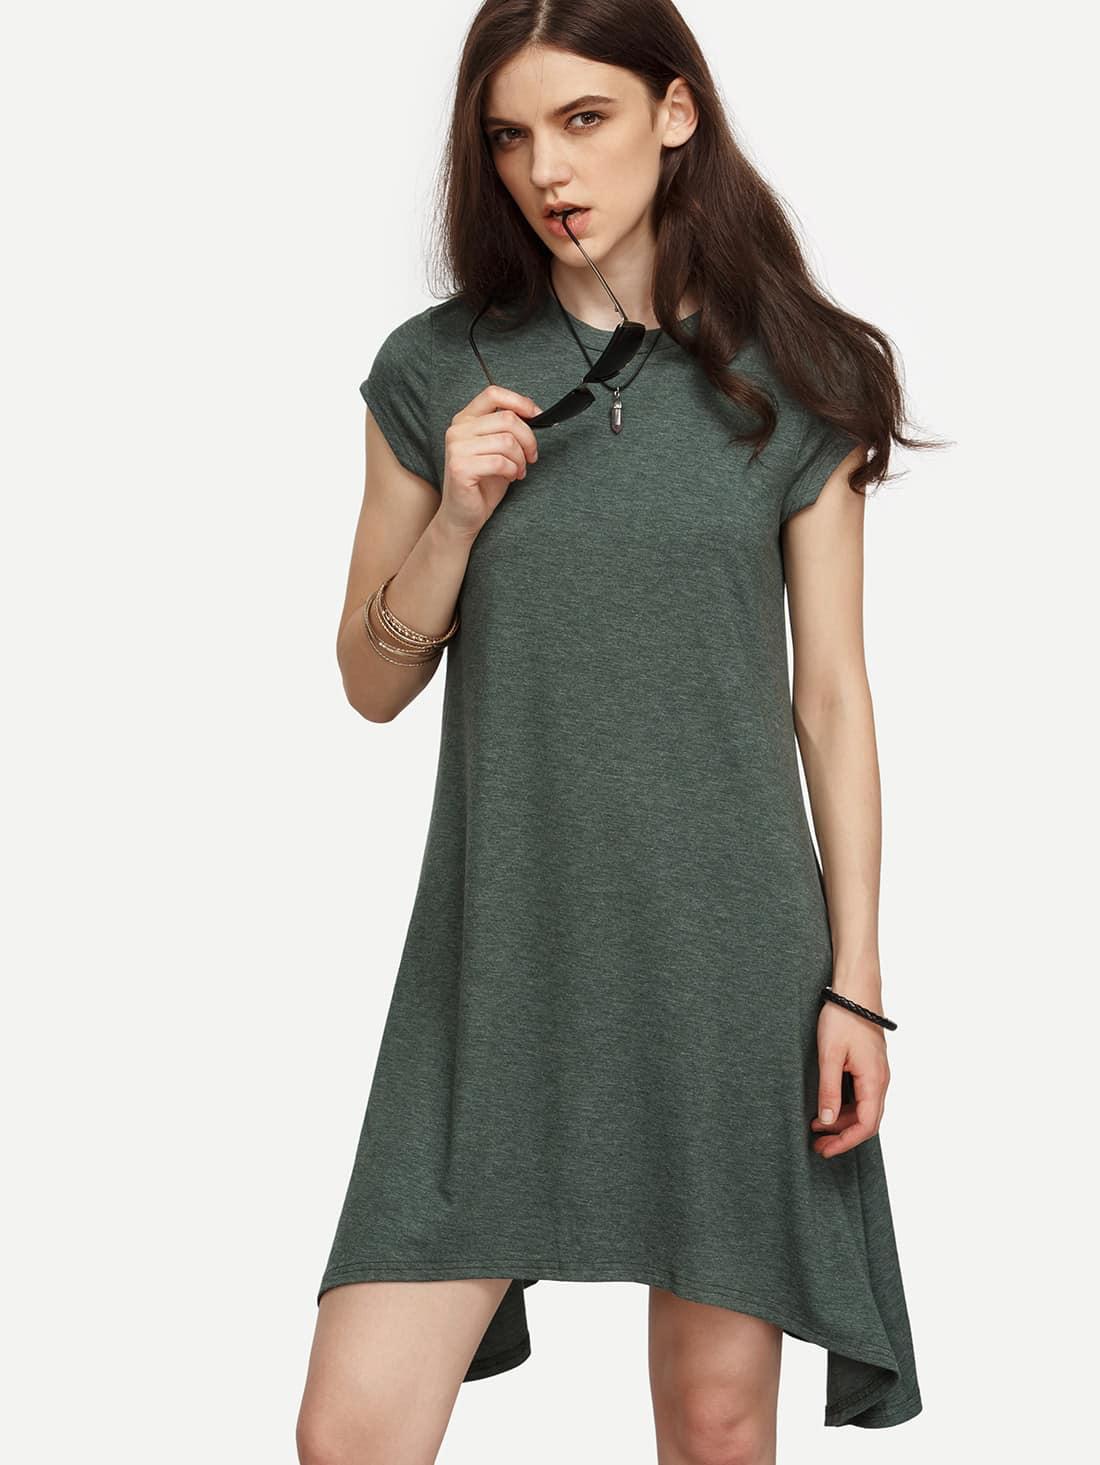 Army Green Cap Sleeve Asymmetrical DressArmy Green Cap Sleeve Asymmetrical Dress<br><br>color: Army Green<br>size: L,M,S,XL,XS,XXL